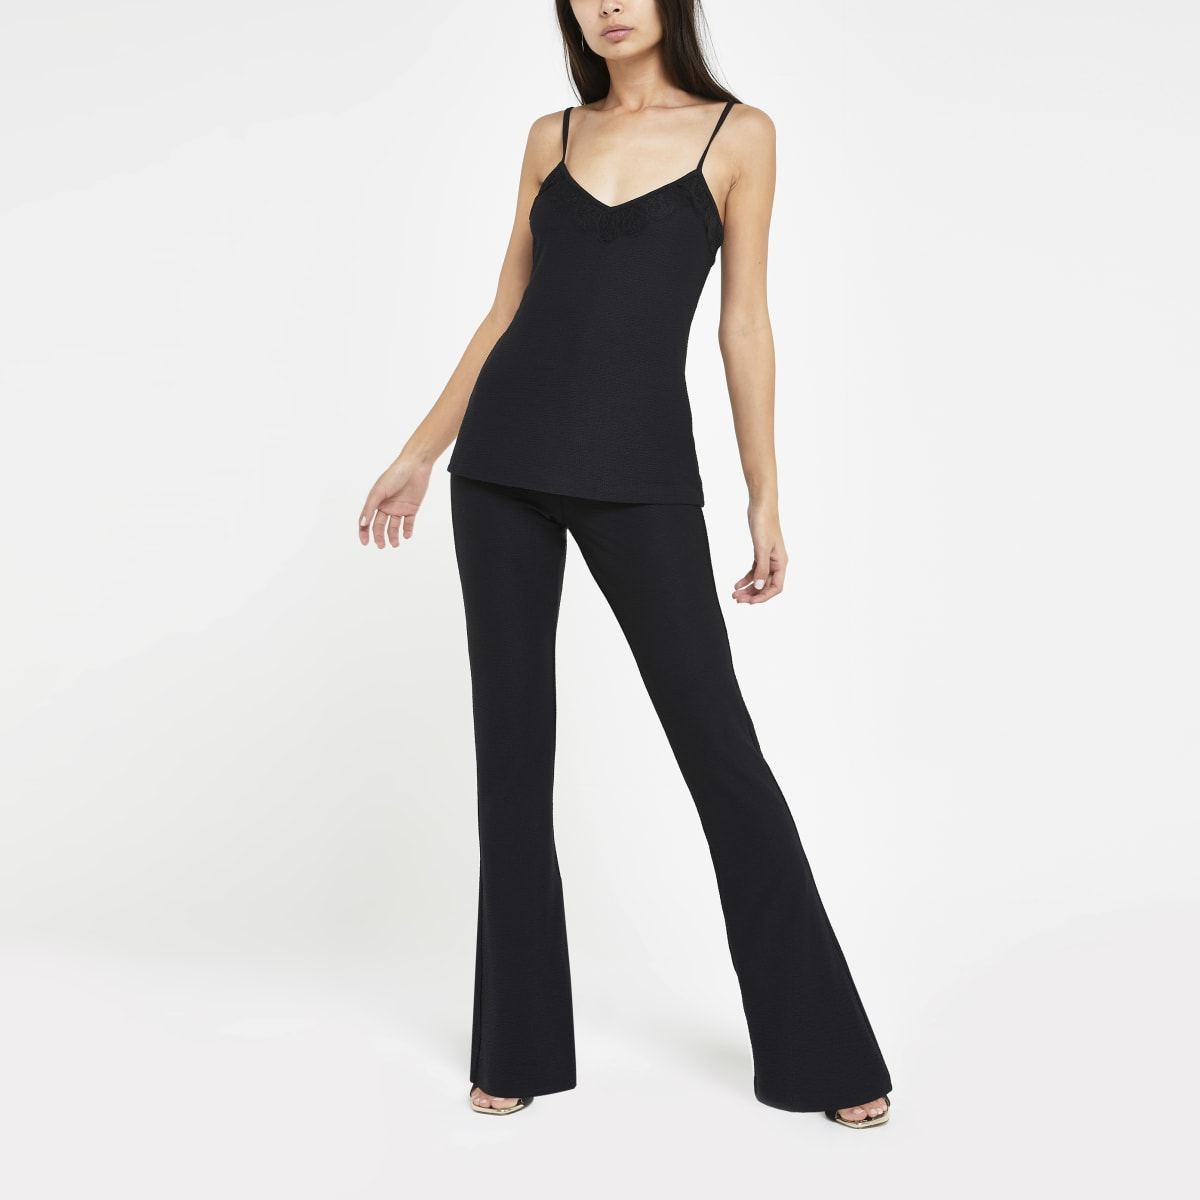 Black high waist jersey flare pants